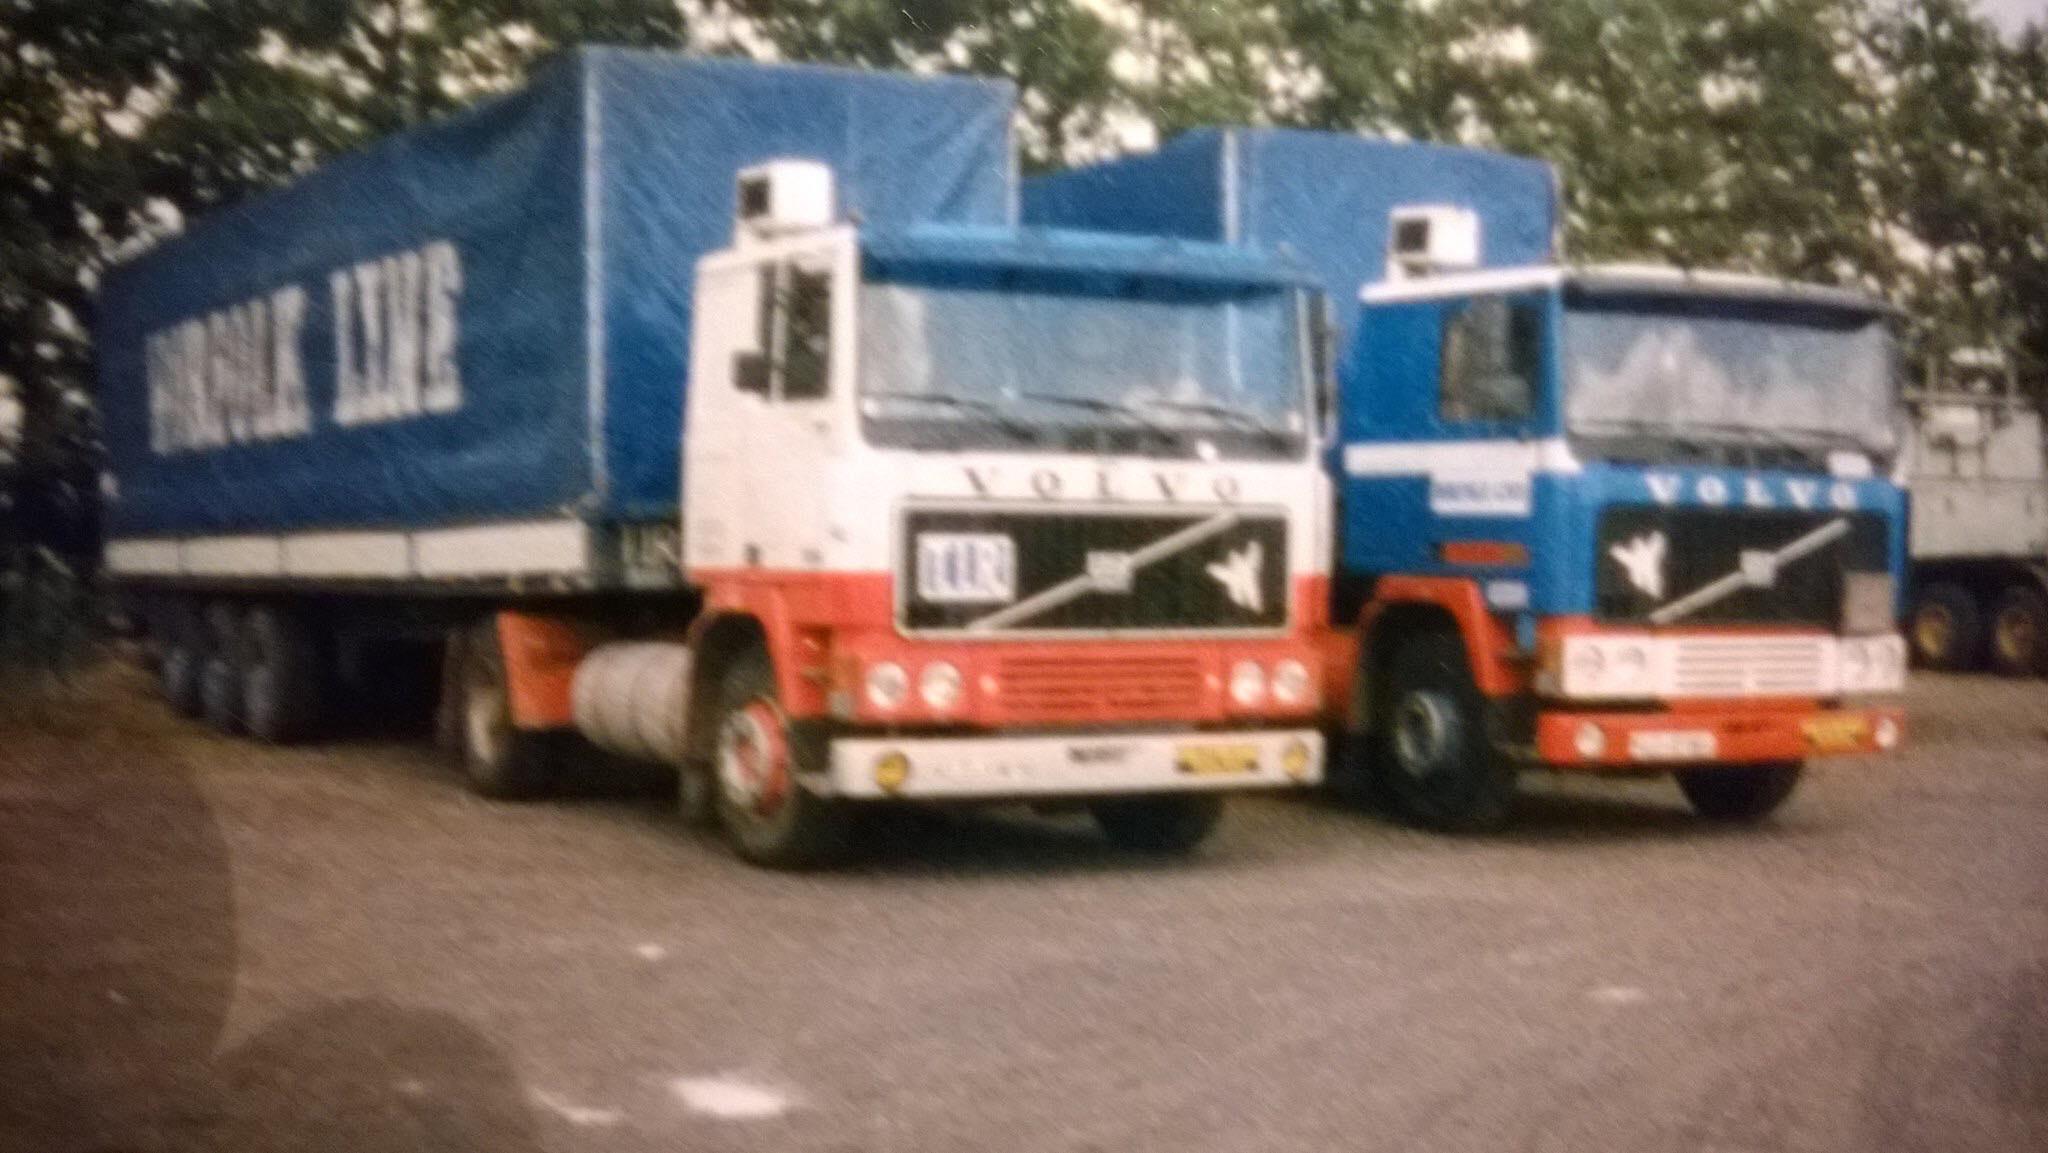 Volvo-Henk-Schmitjes-foto-archief-20